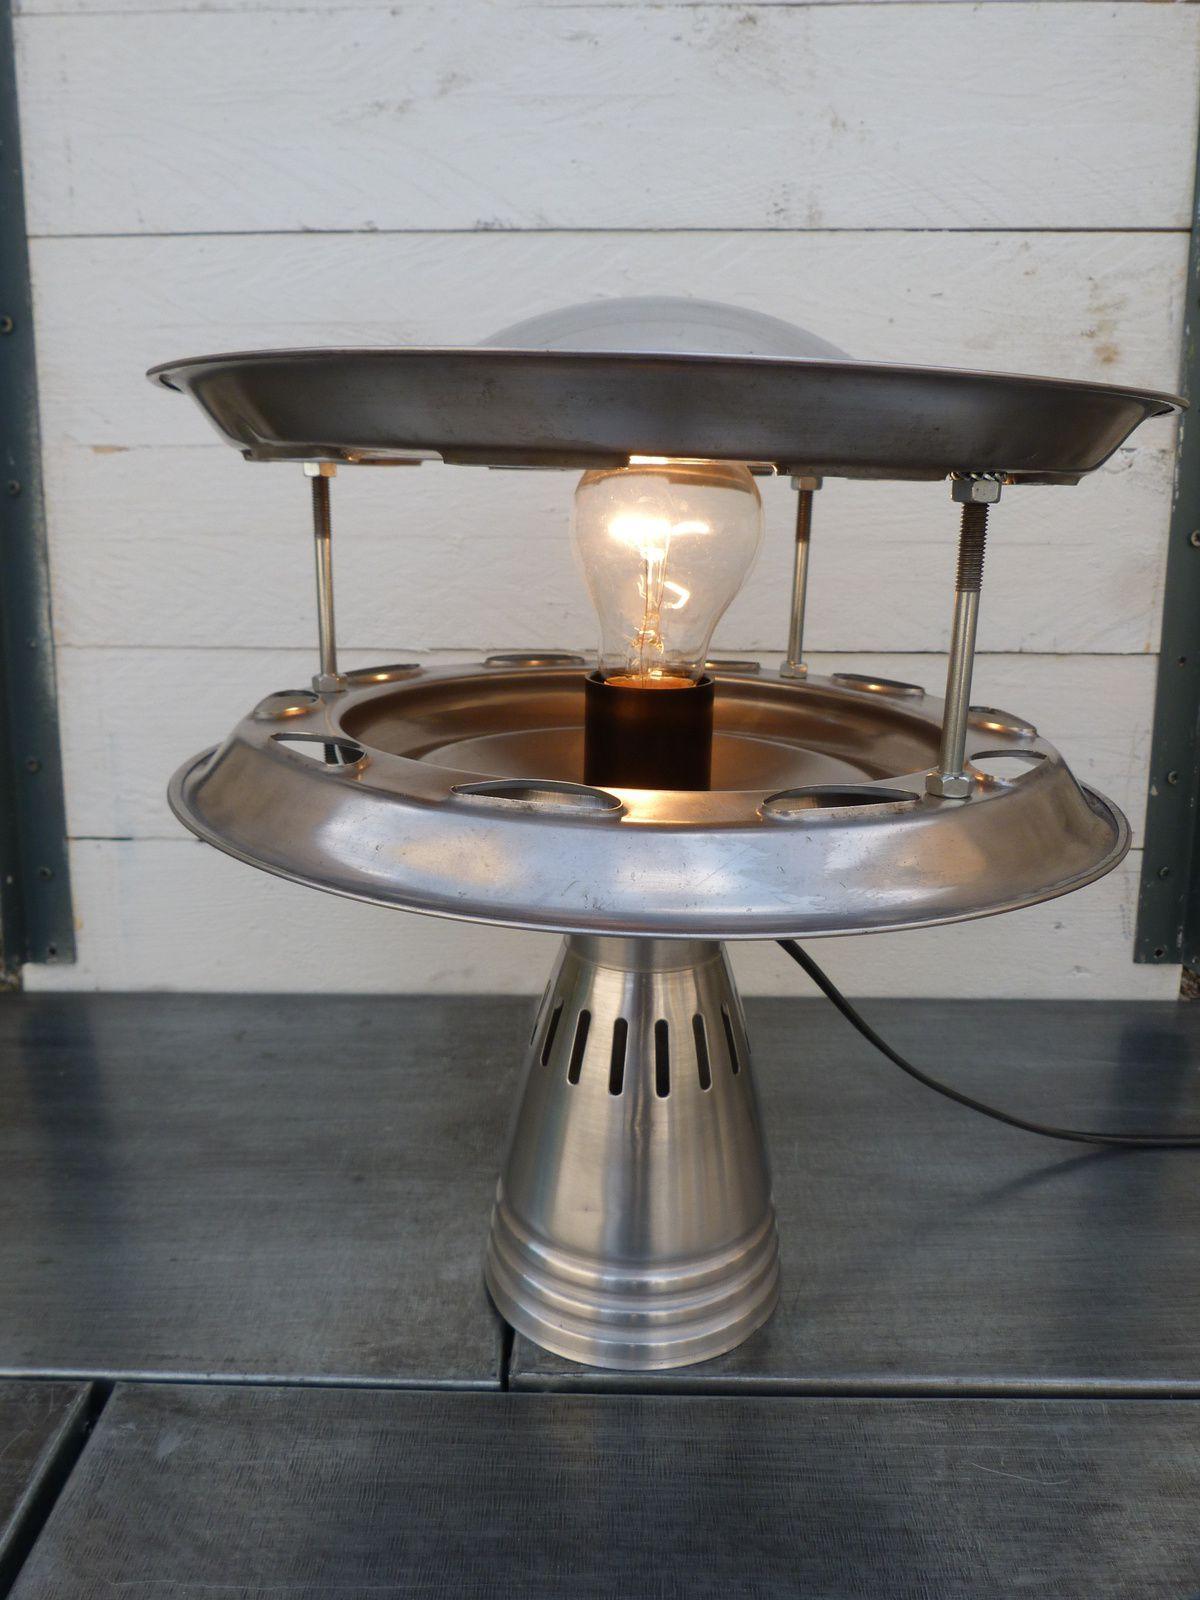 Lampe soucoupe volante ovni ufo ju and b - Lampe soucoupe volante ...